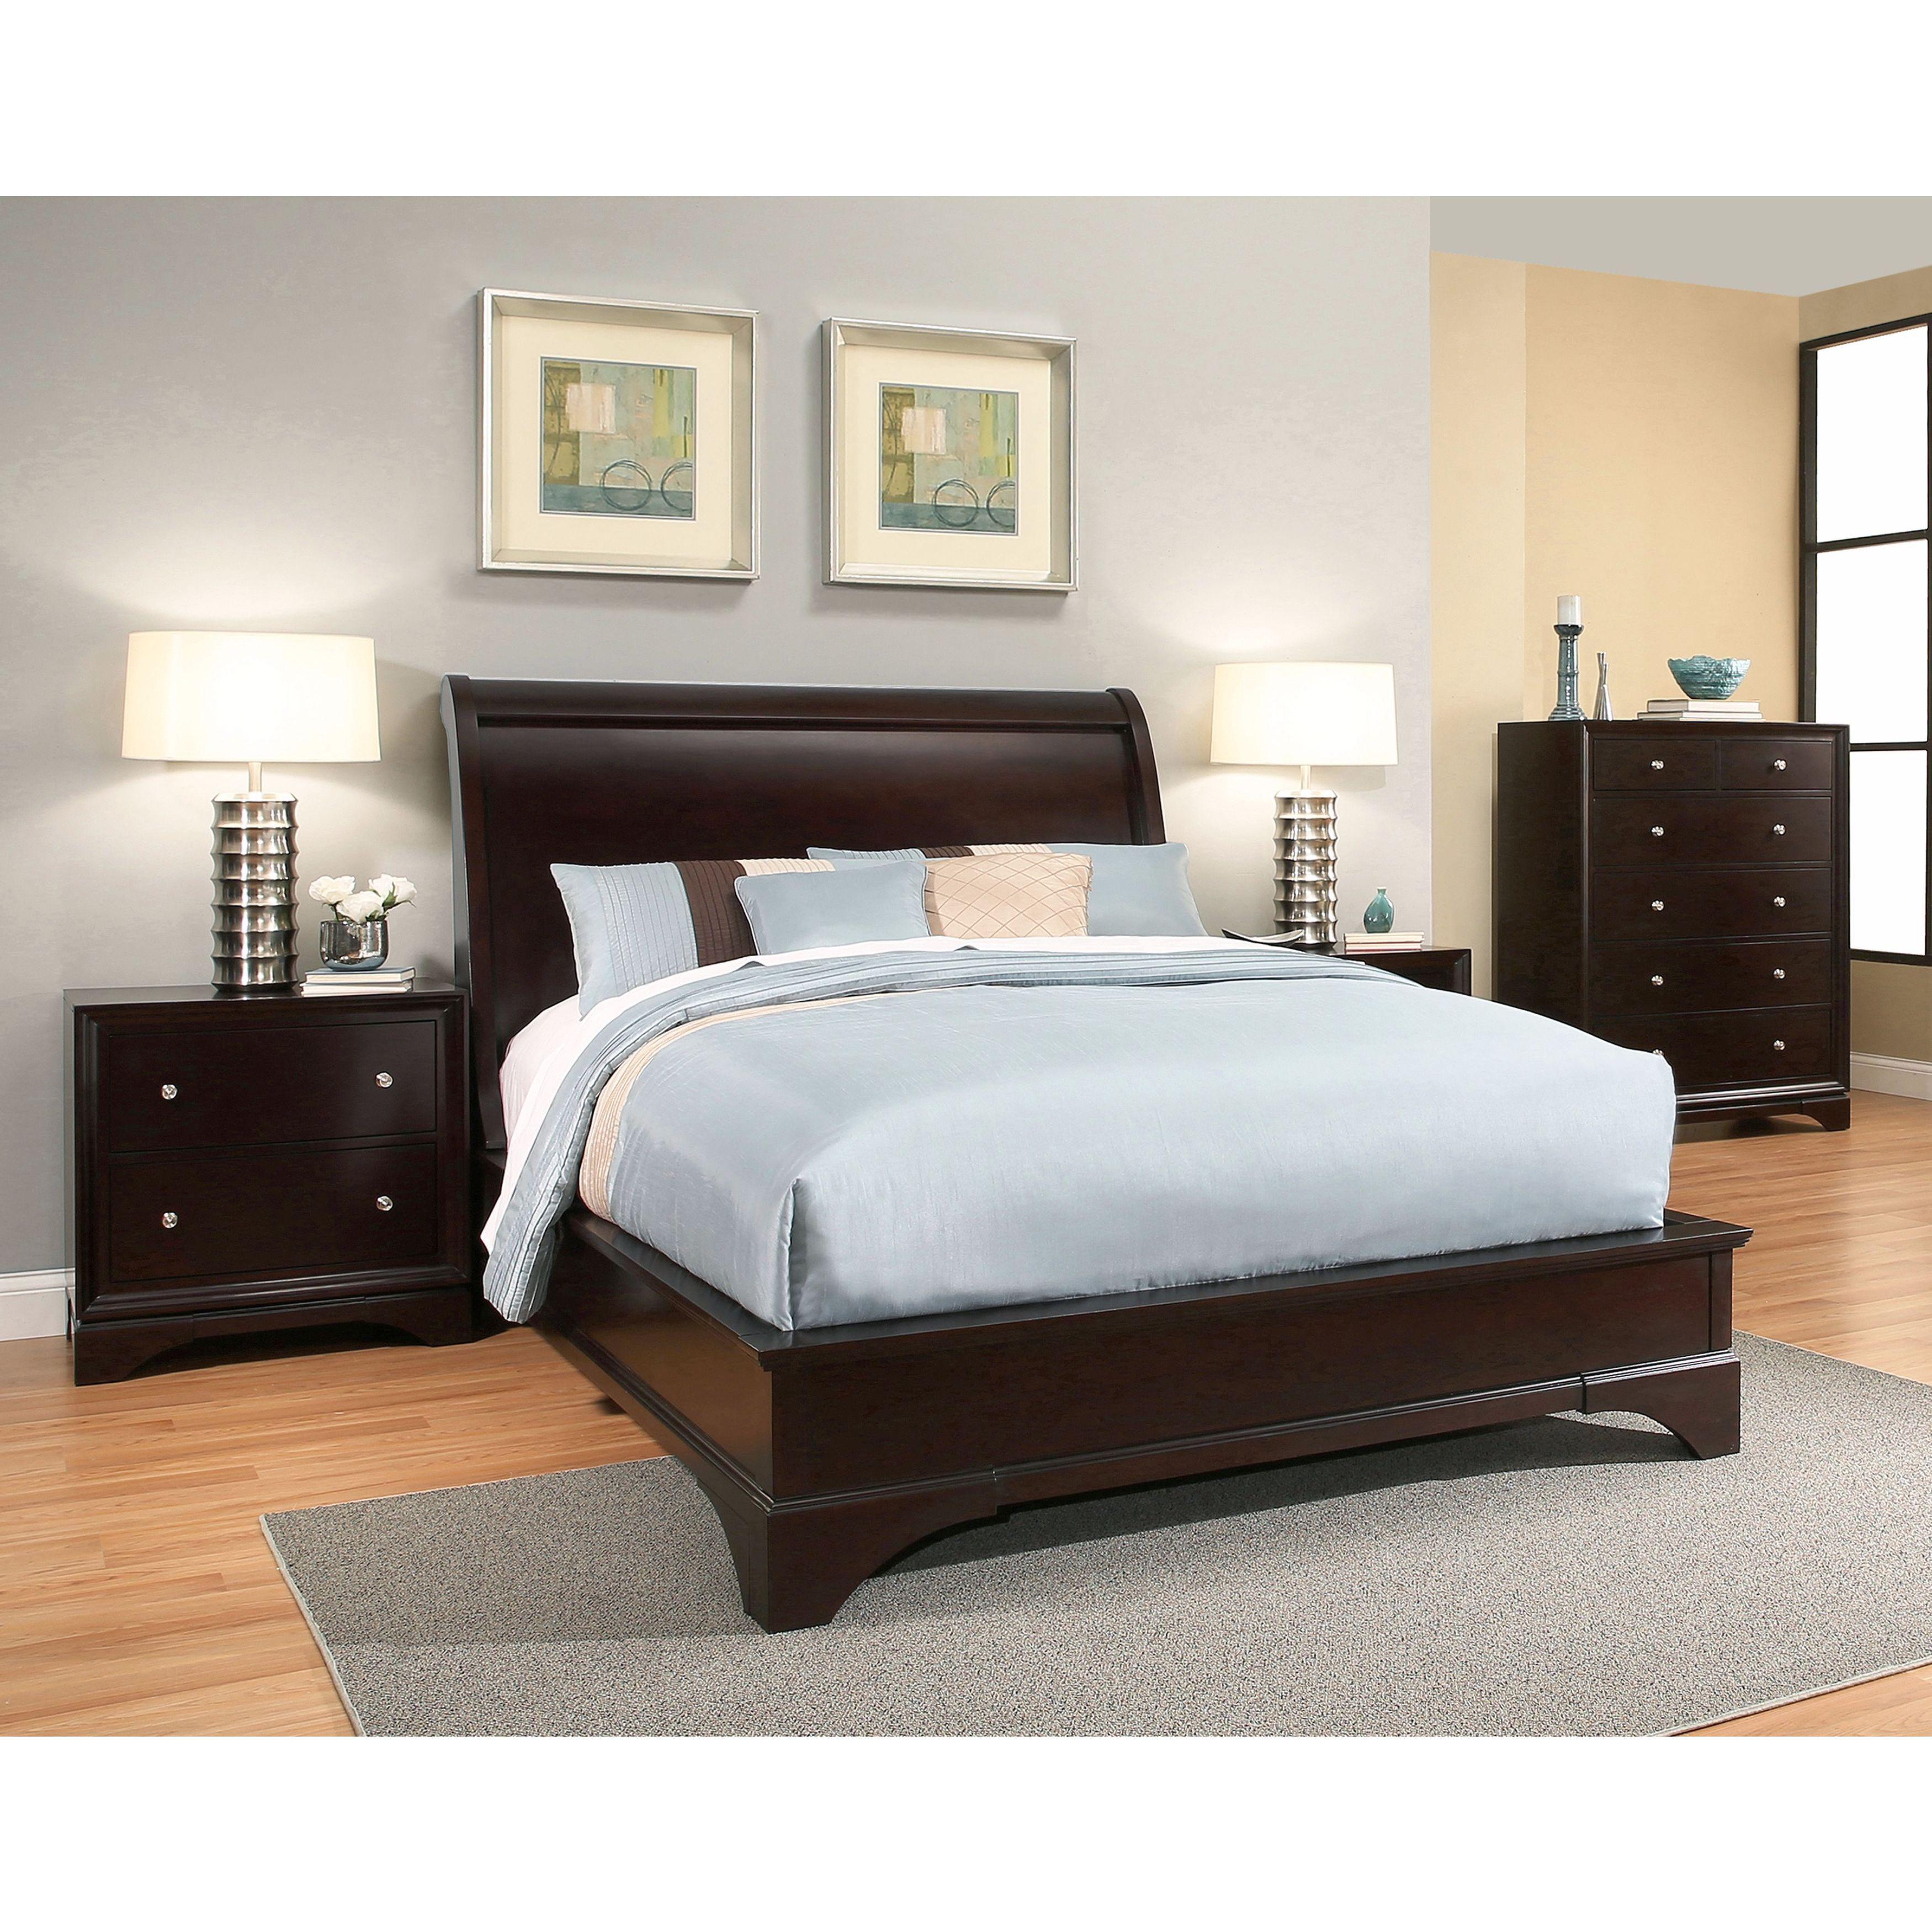 Abbyson Sydney 4-Piece Espresso Wood Bedroom Set - Free Shipping ...